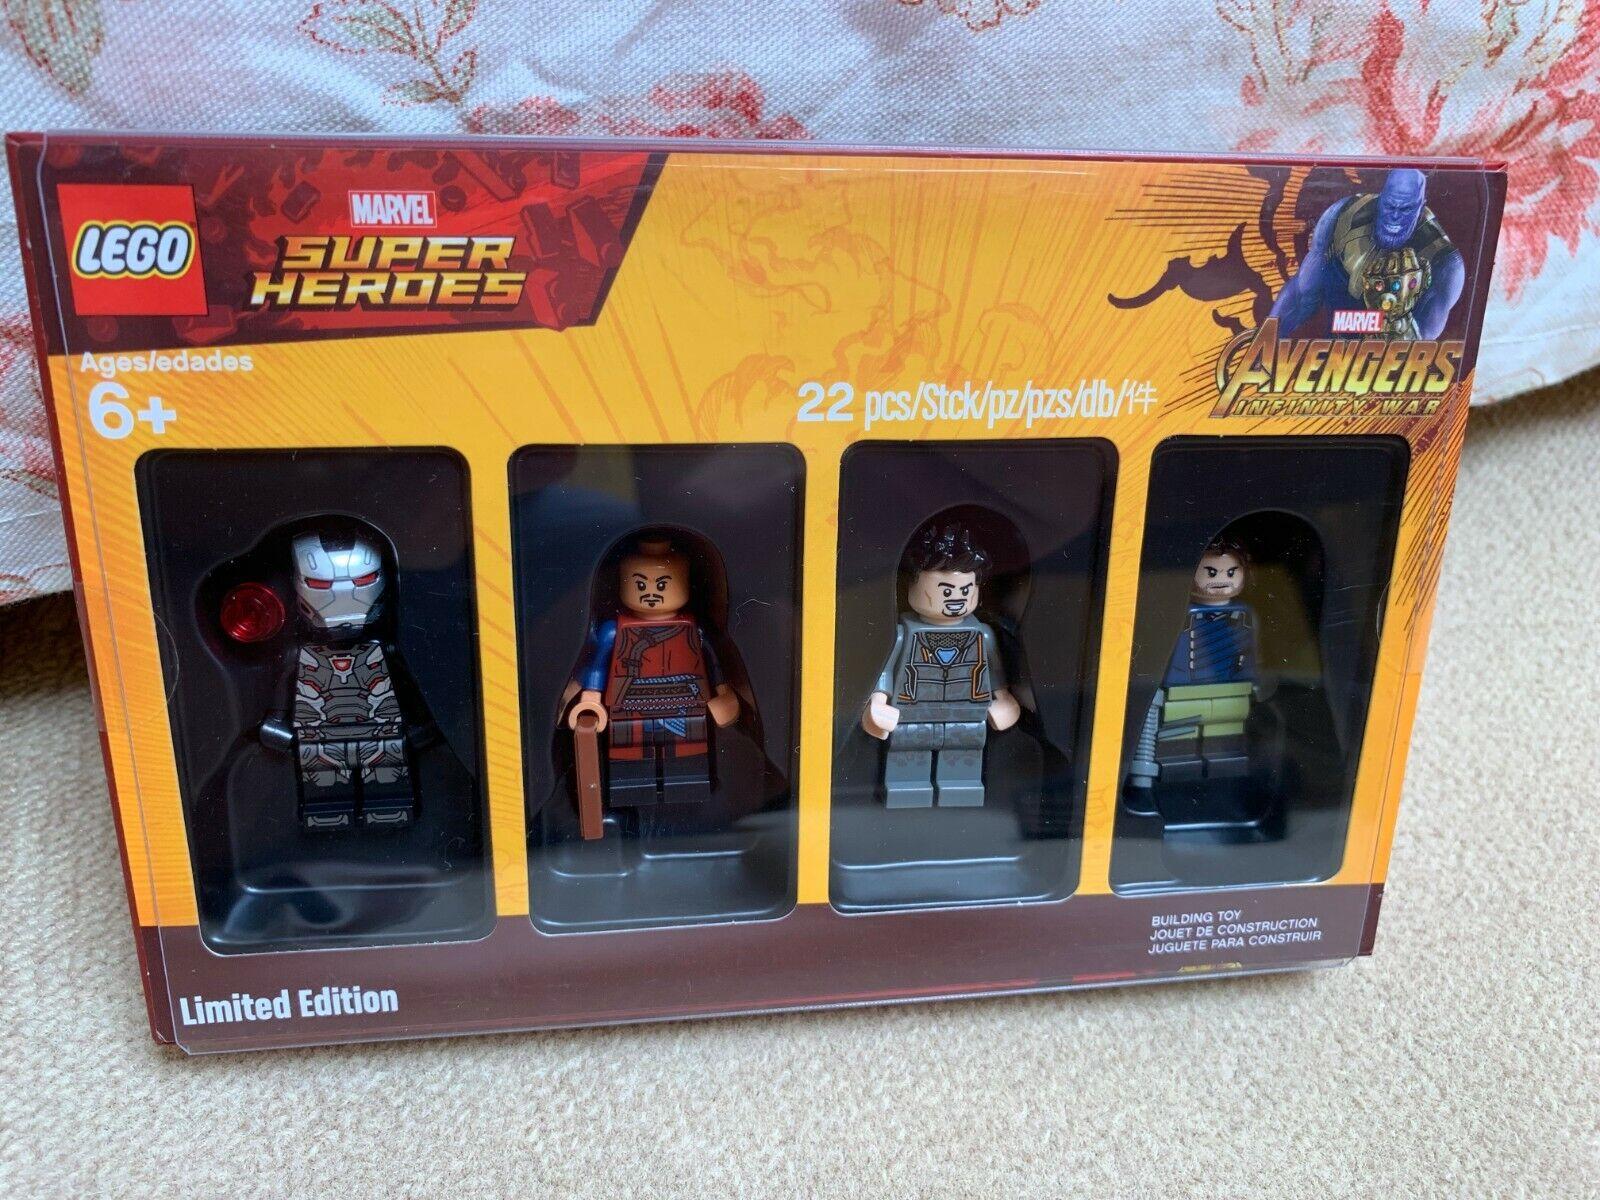 LEGO Super Heroes 5005256 Minifigure Collection, Bricktober 2018 4 4 (Exclusive)